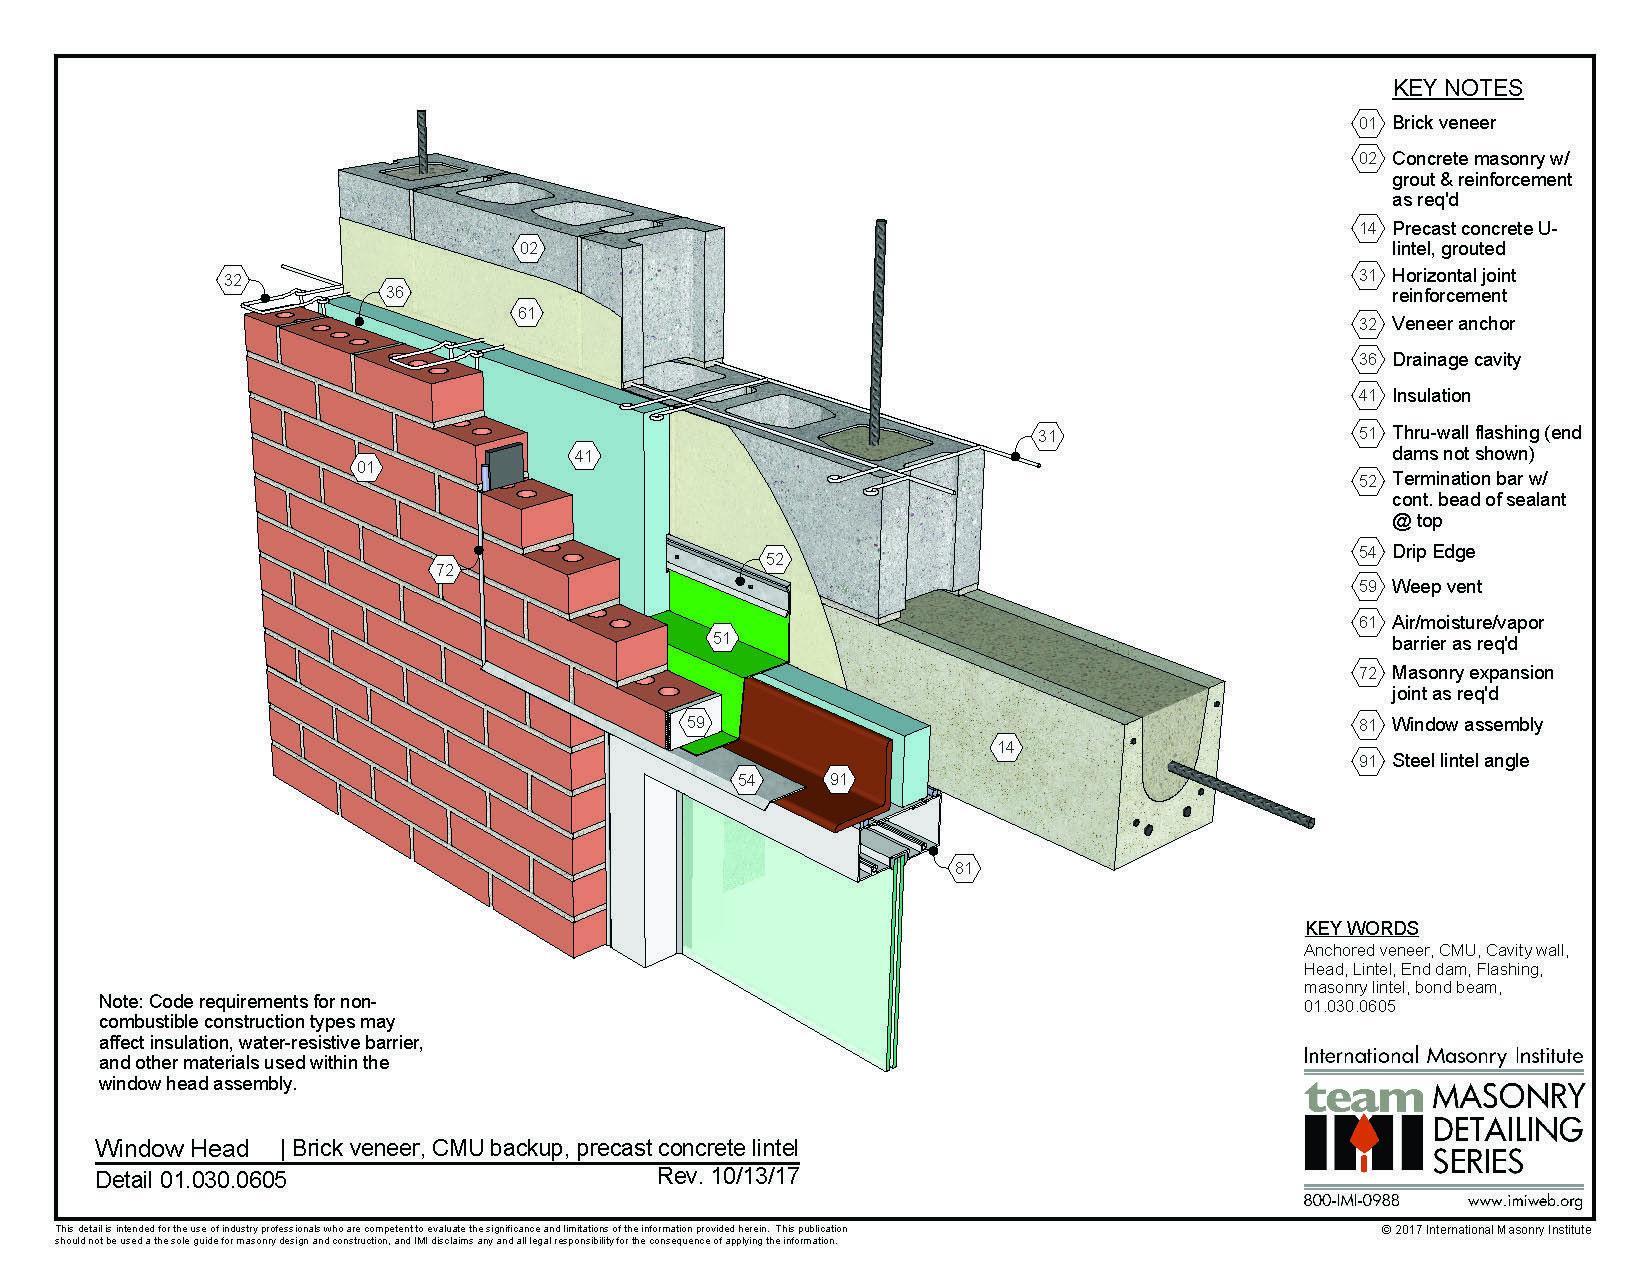 01 030 0605 Window Head Brick Veneer Cmu Backup Precast Concrete Lintel International Masonry Institute In 2020 Concrete Lintels Precast Concrete Brick Veneer